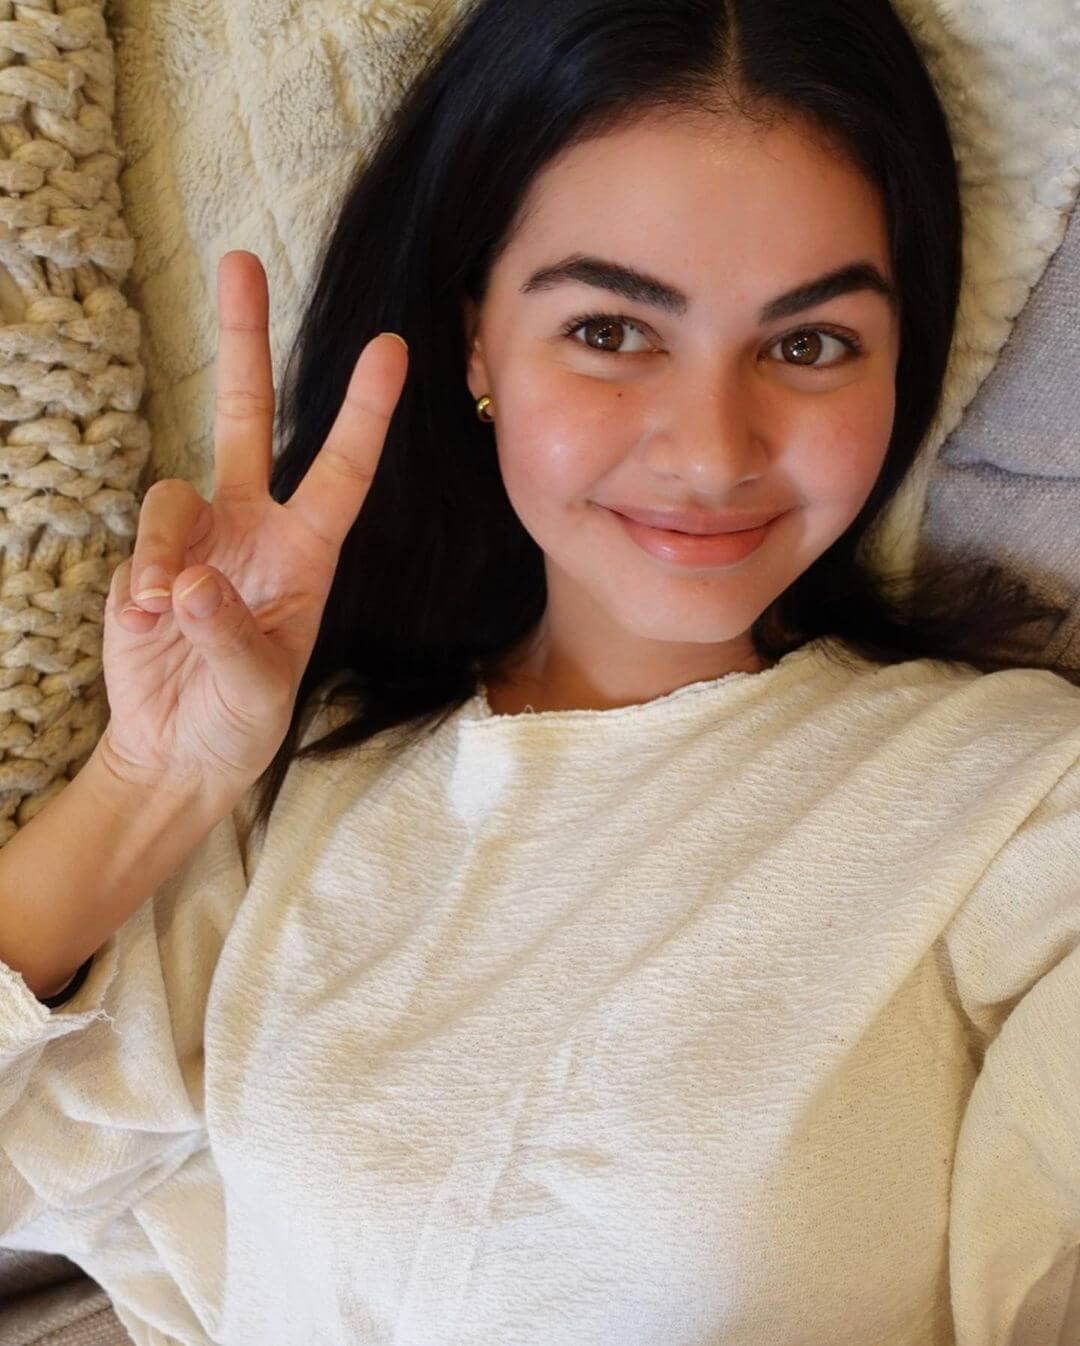 Beautiful Smile Of Janine Gutierrez